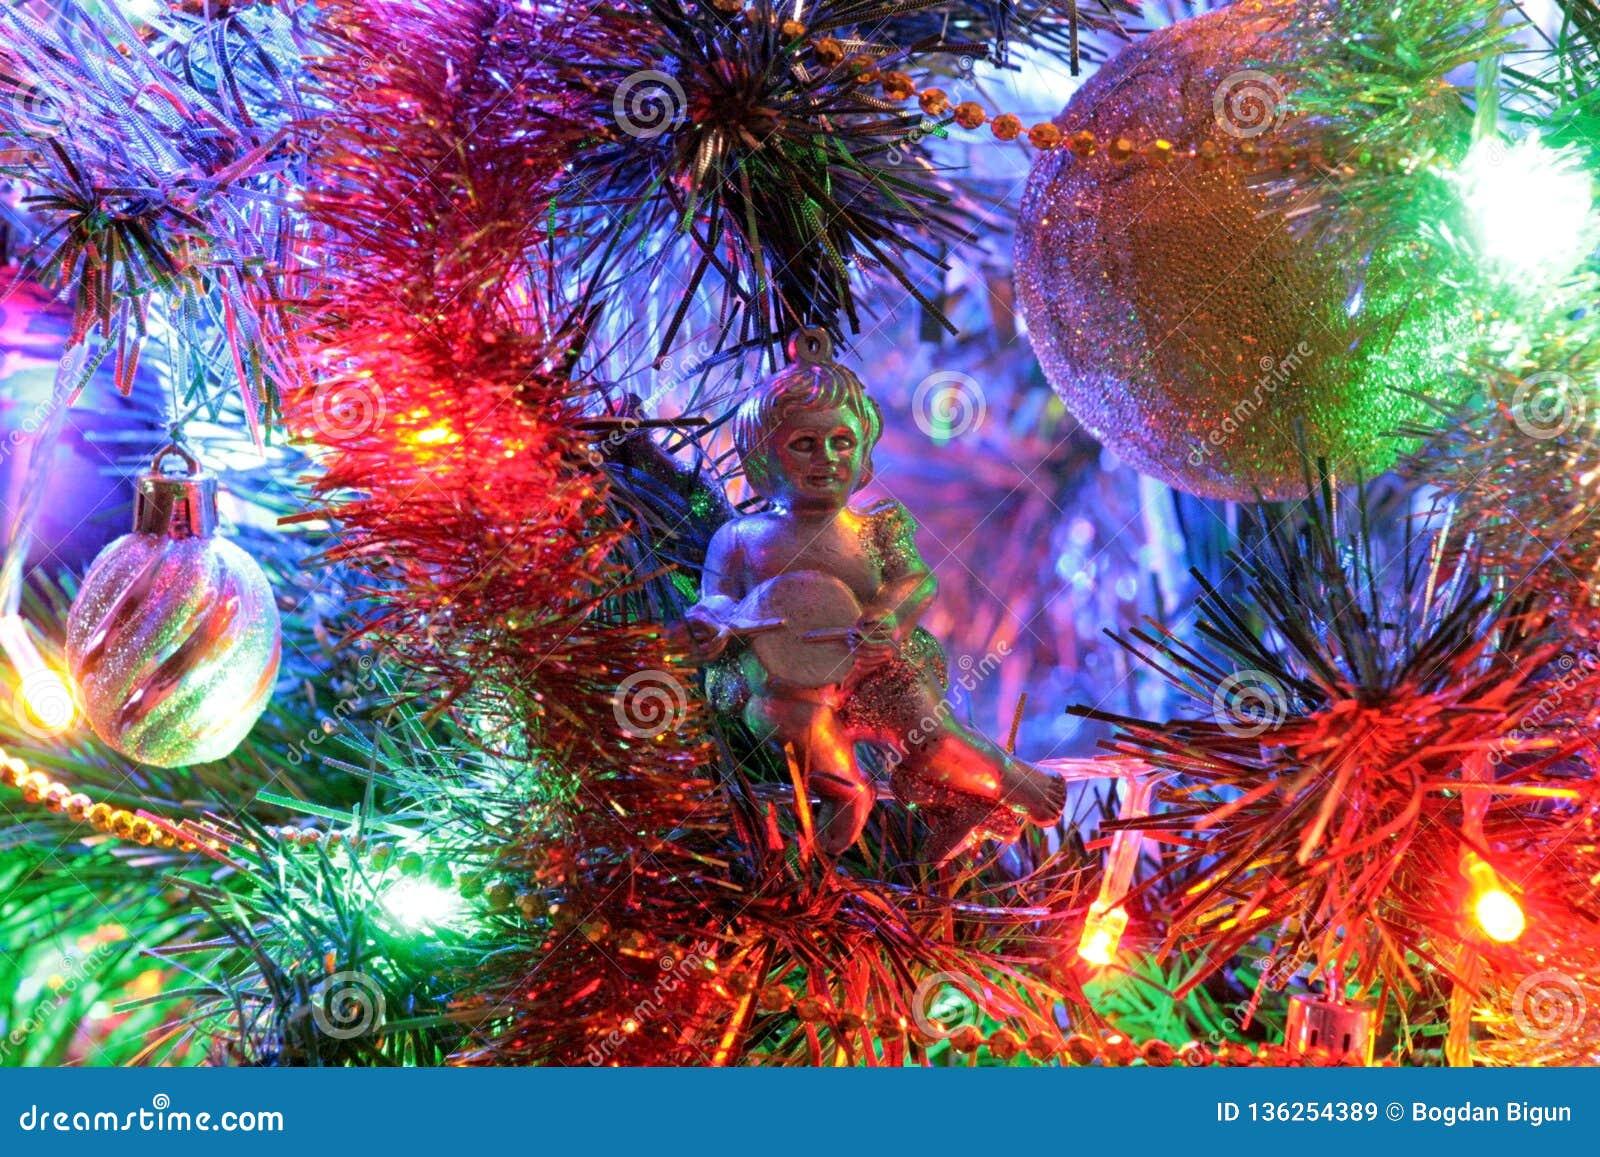 Angel, Christmas decoration and beautiful illumination.